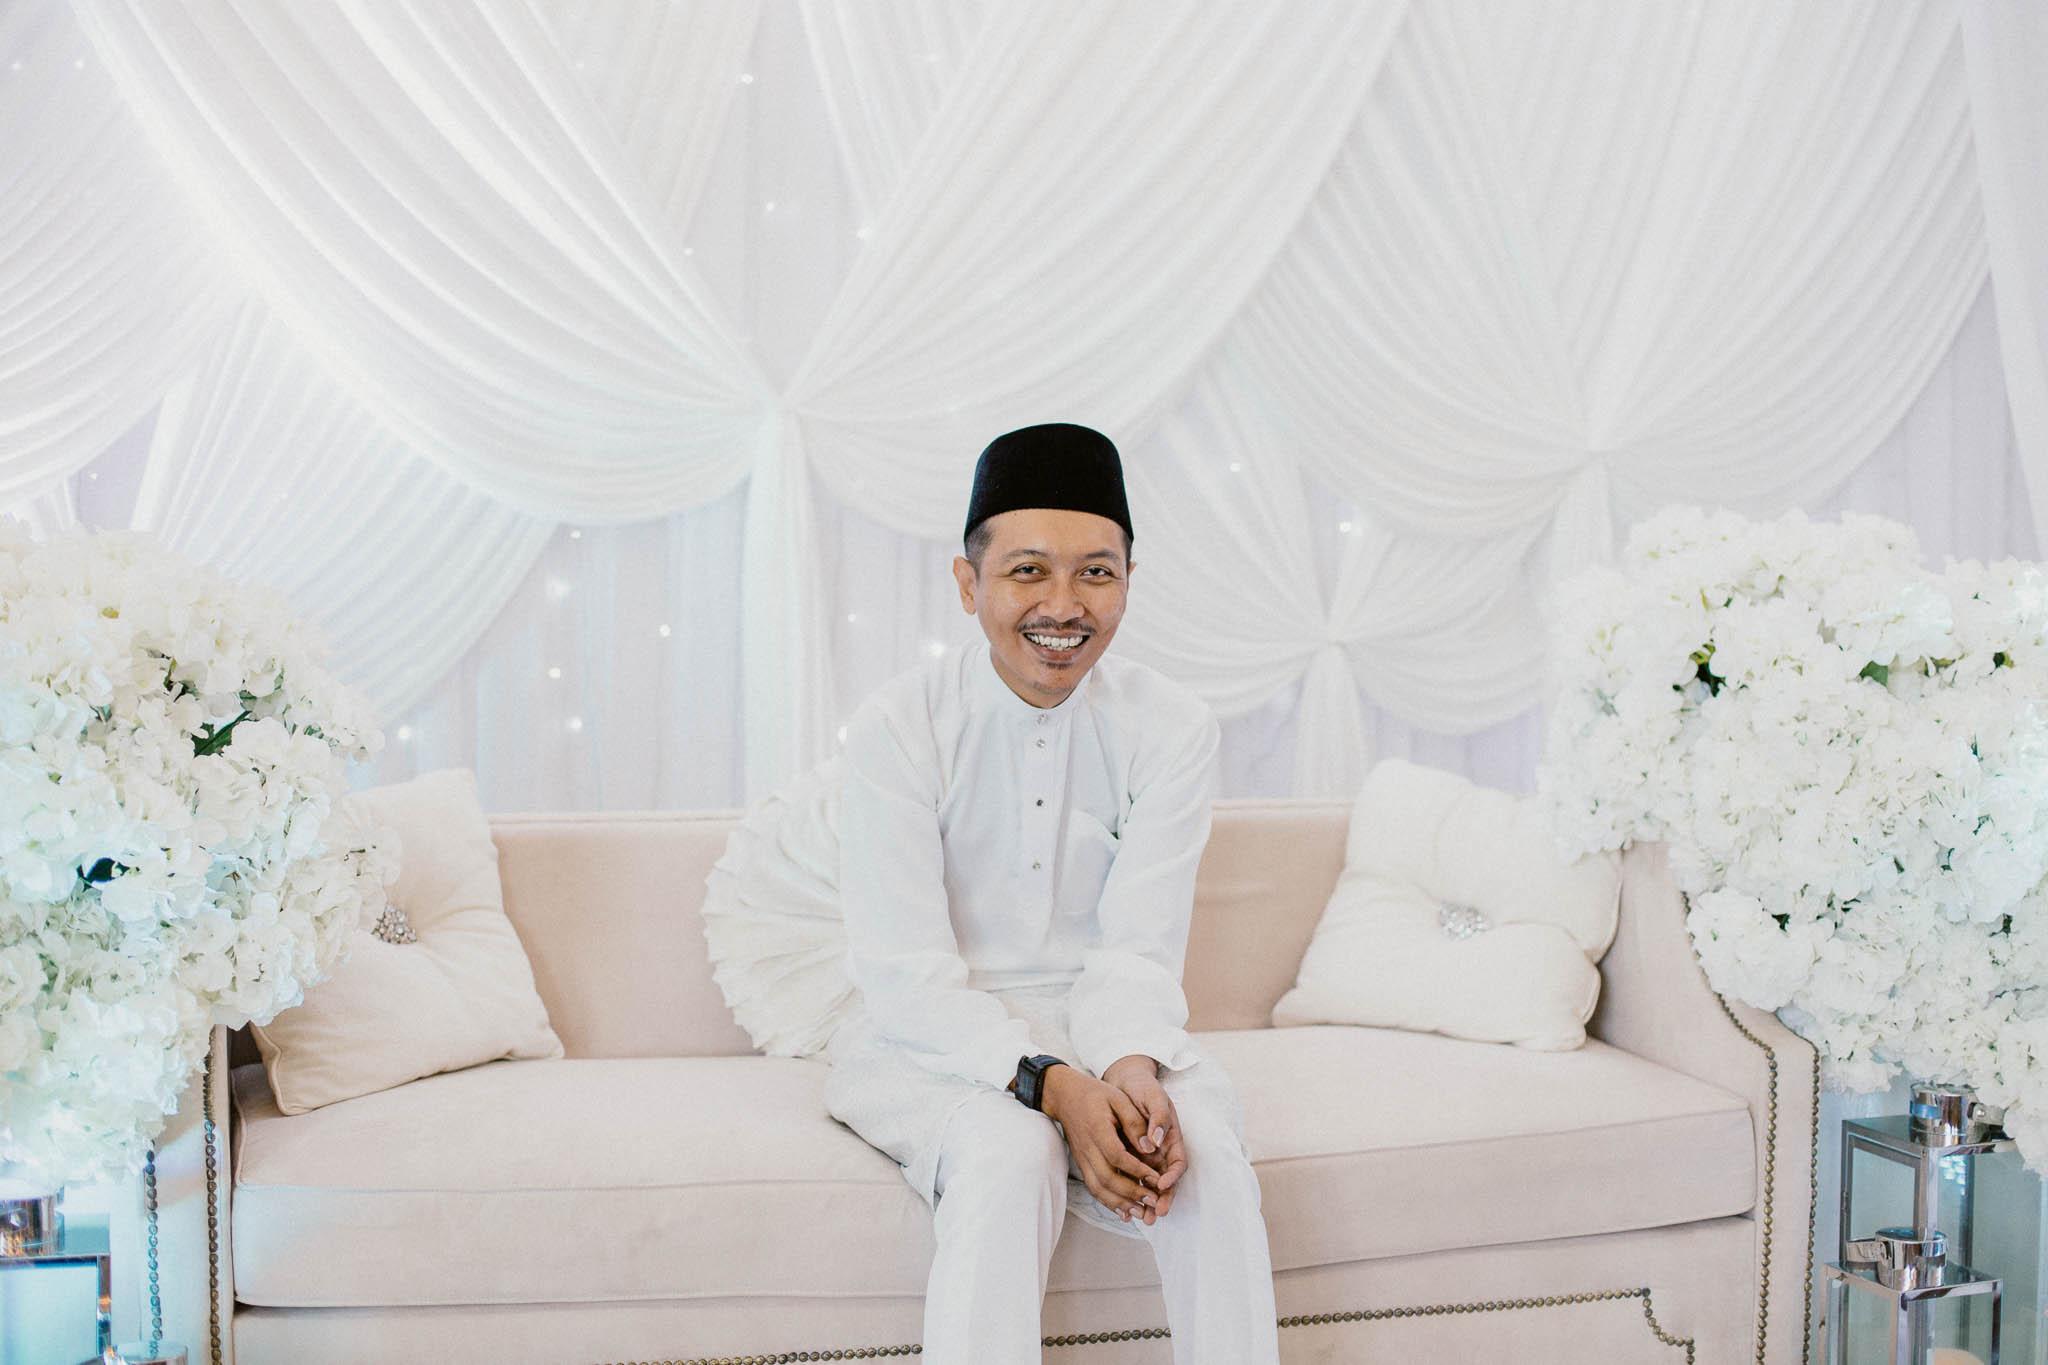 singapore-wedding-photographer-addafiq-nufail-034.jpg